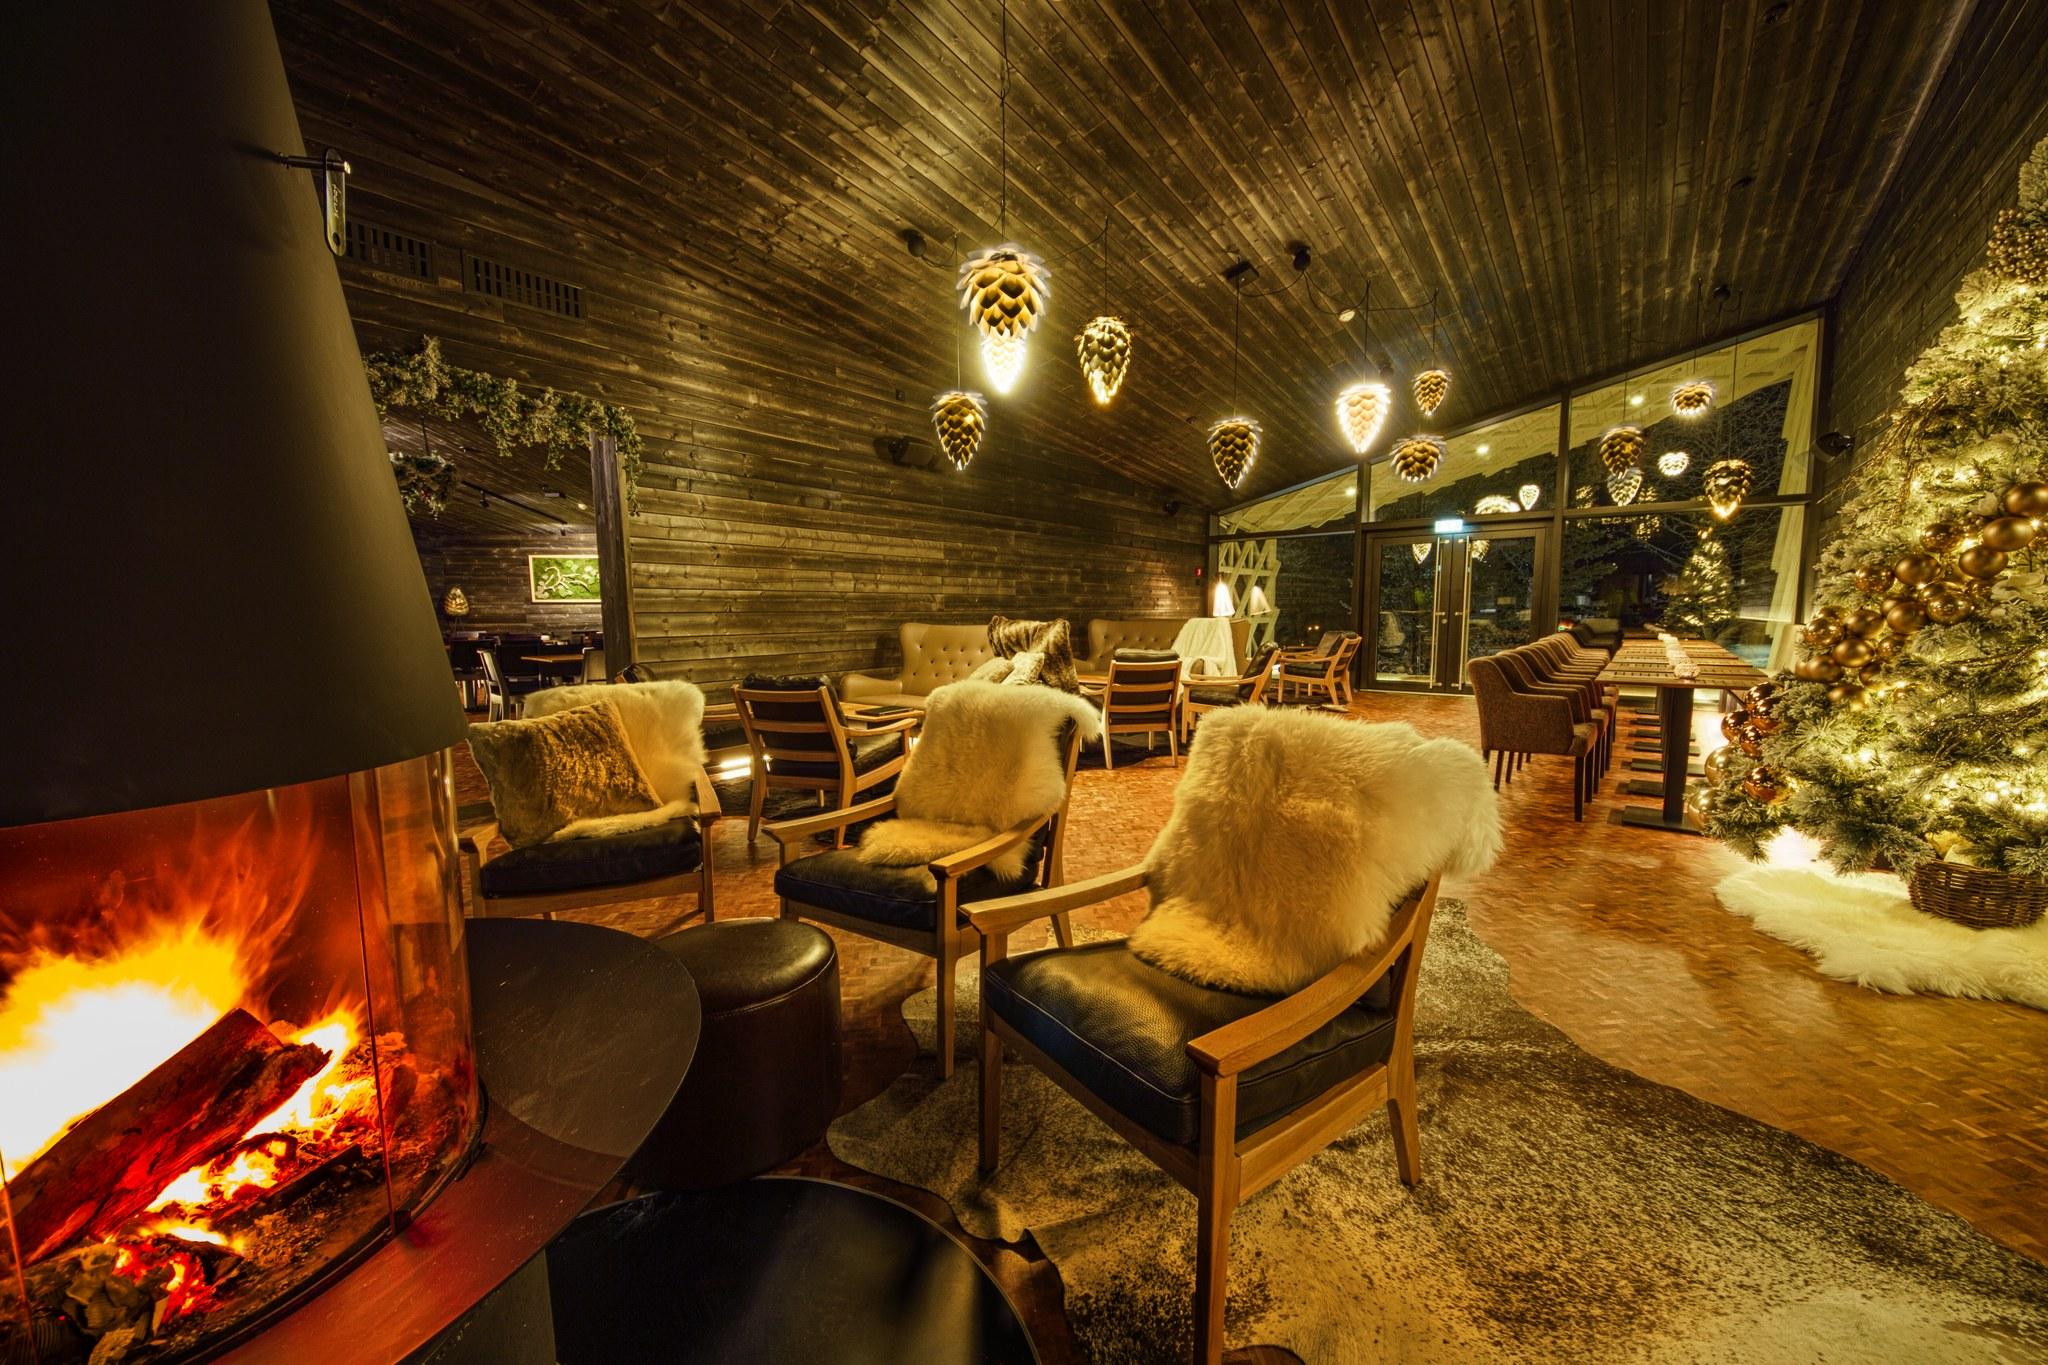 Arctic TreeHouse Hotel Rakas Restaurant Lounge in Rovaniemi Lapland Finland